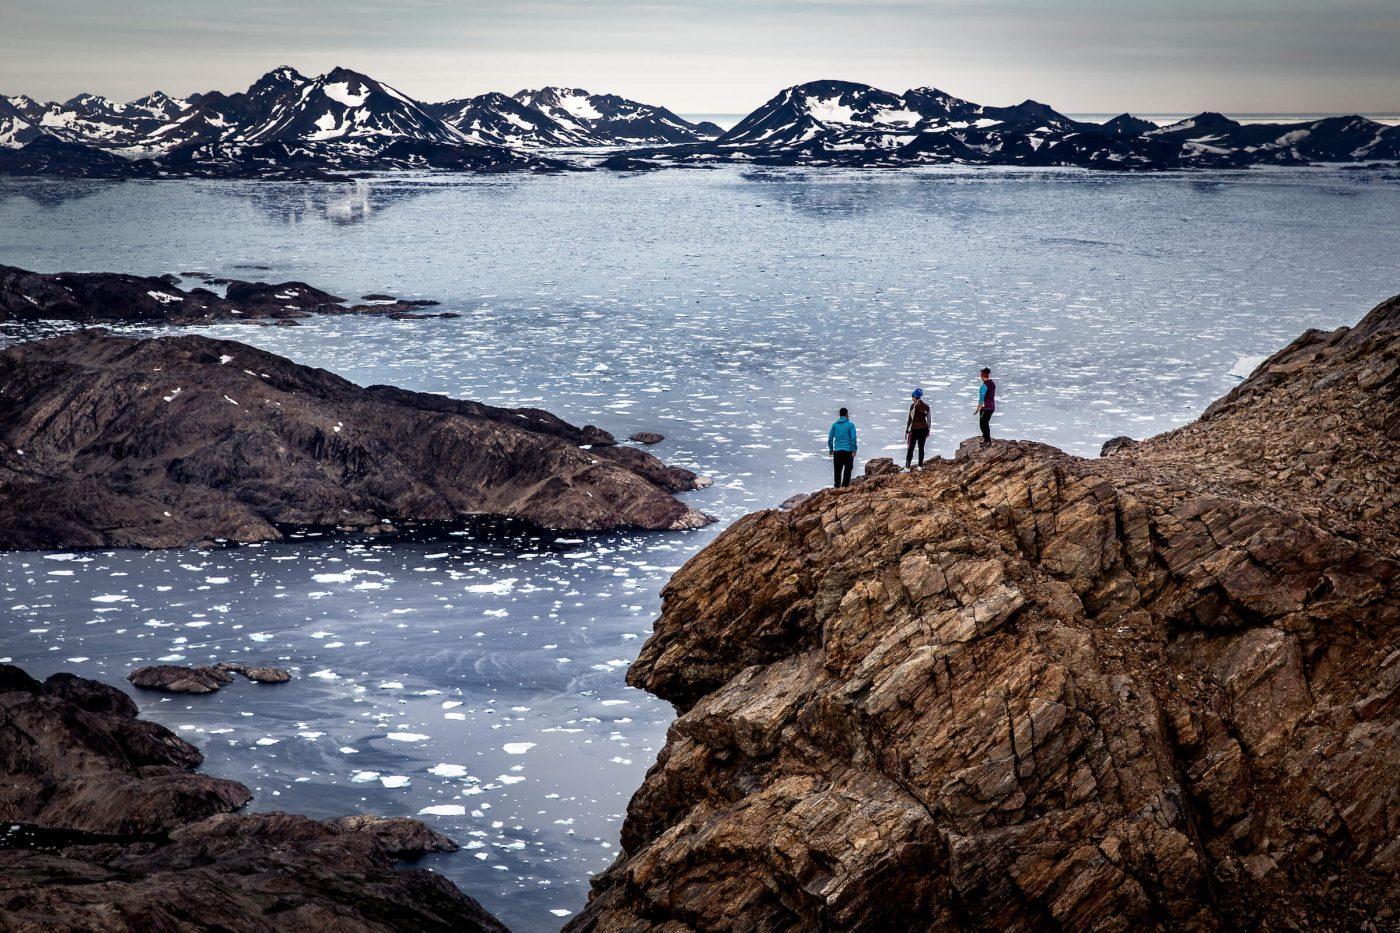 Hikers on Sømandsfjeldet near Tasiilaq in East Greenland. Photo by Mads Pihl, Visit Greenland